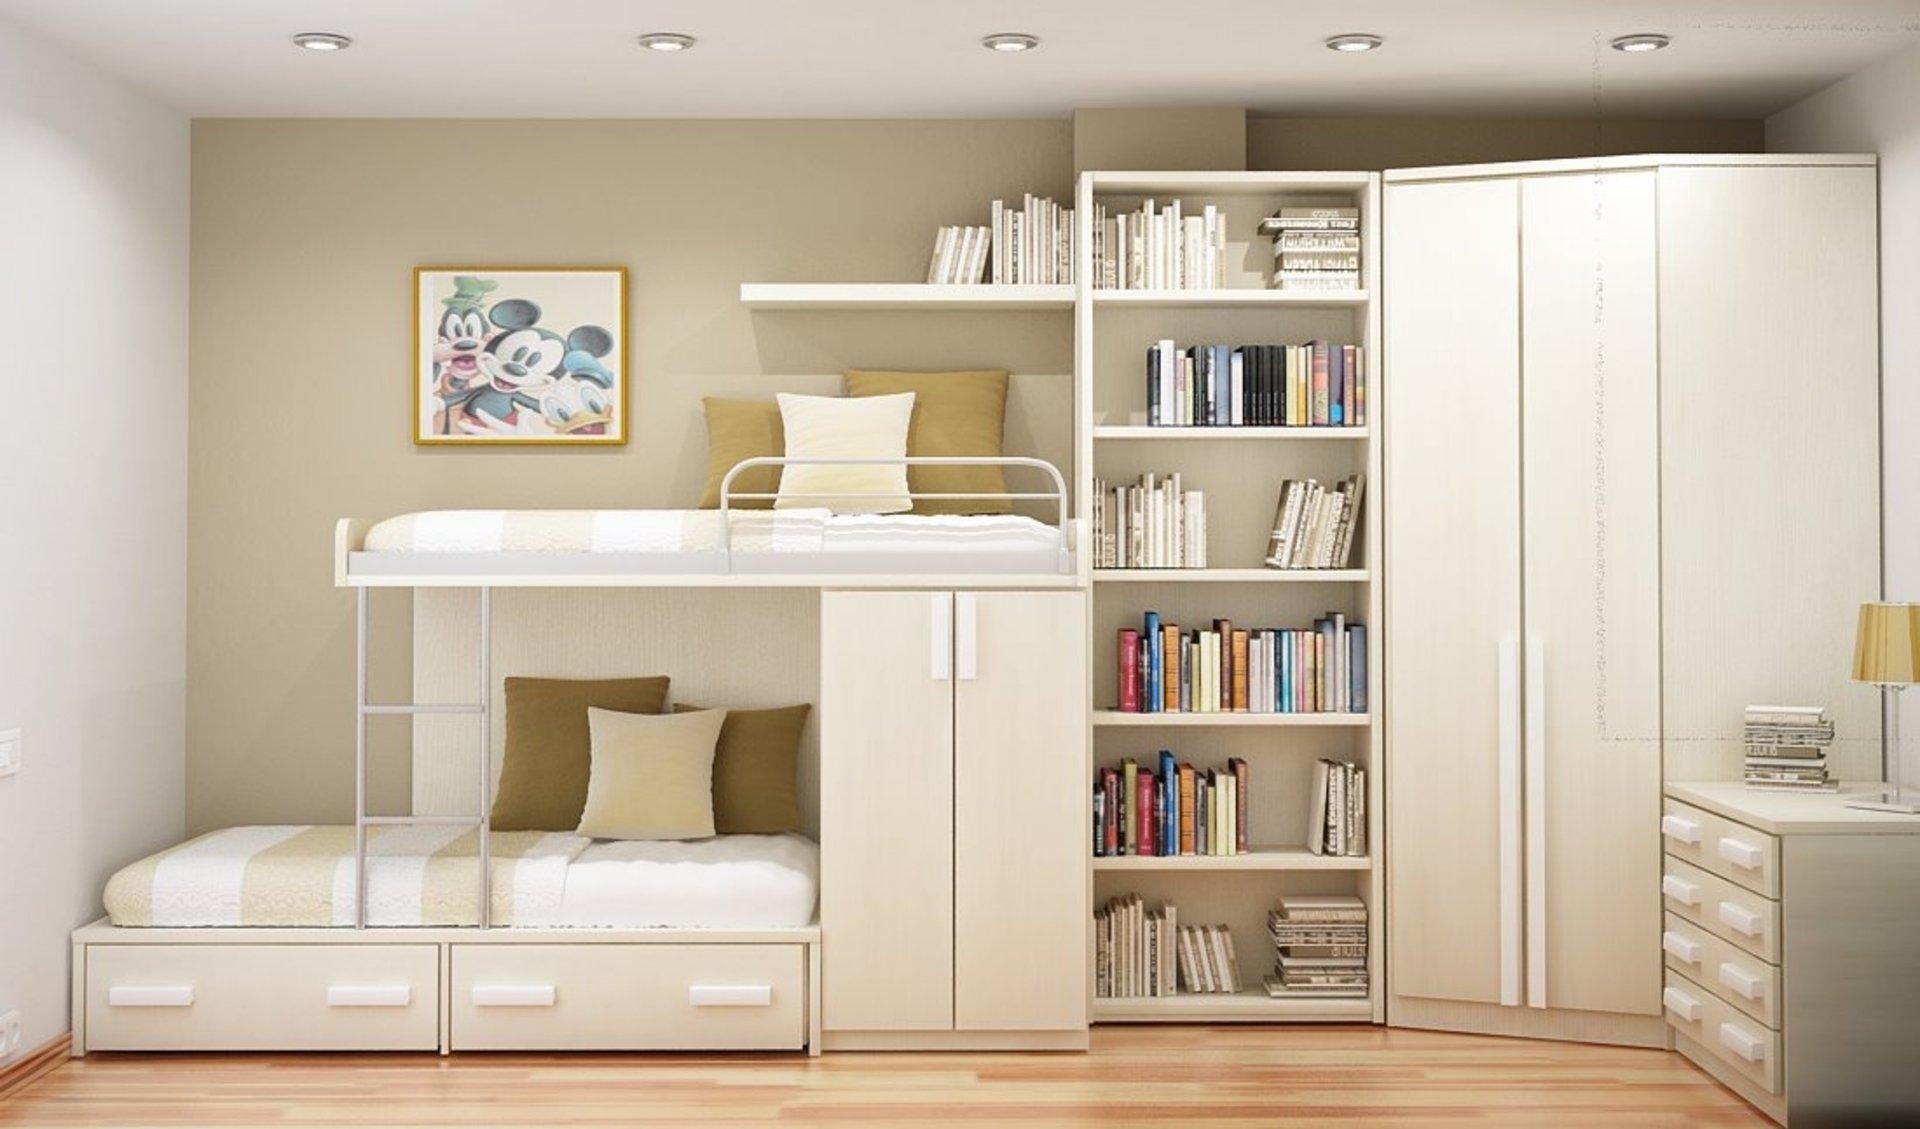 10 Unique Kids Bedroom Ideas For Small Rooms bedroom fantastic kids bedroom and interior for girls kids bedroom 2020